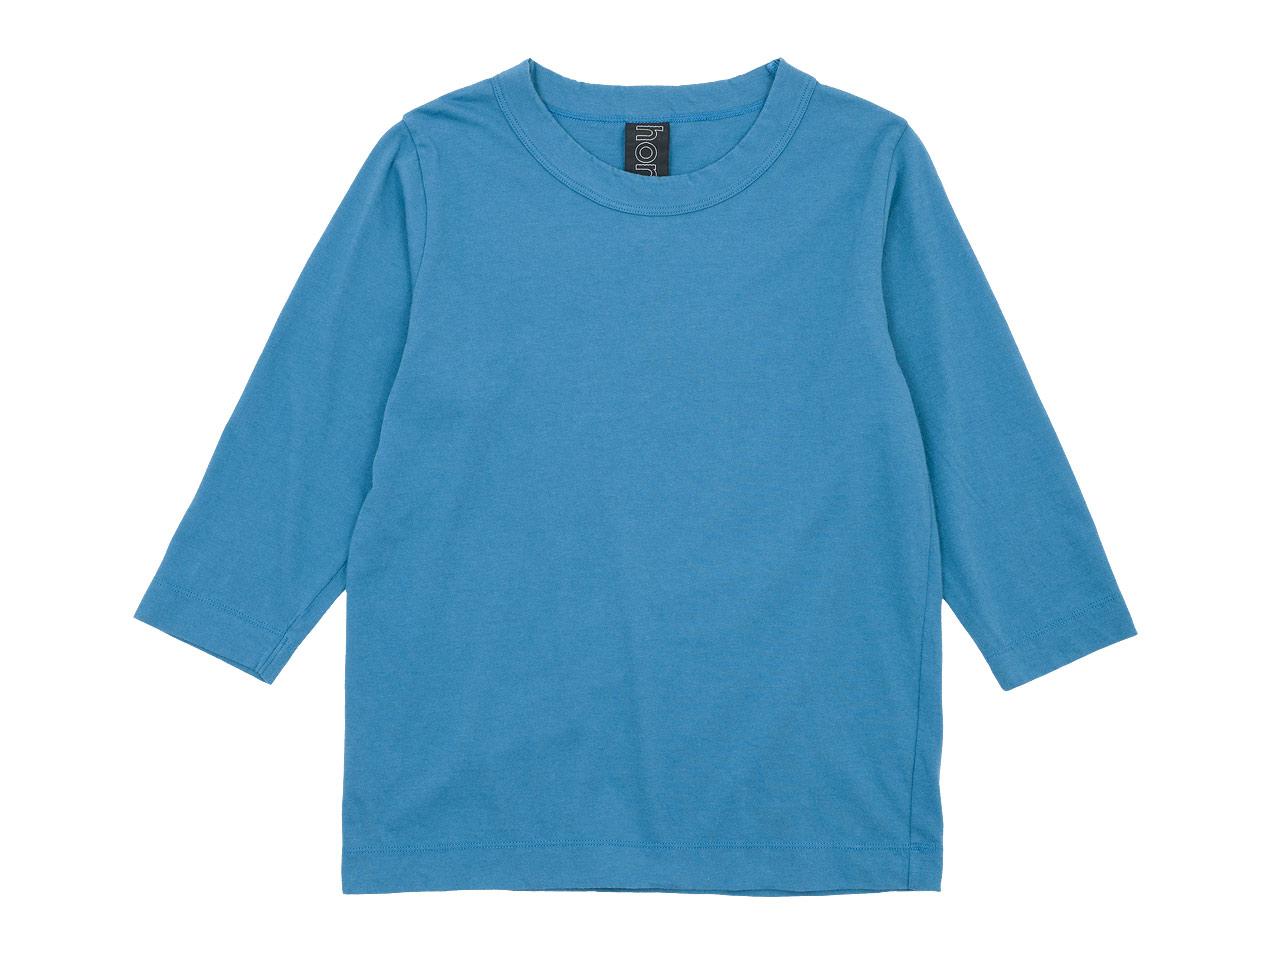 homspun 30/1天竺 七分袖Tシャツ / 長袖Tシャツ